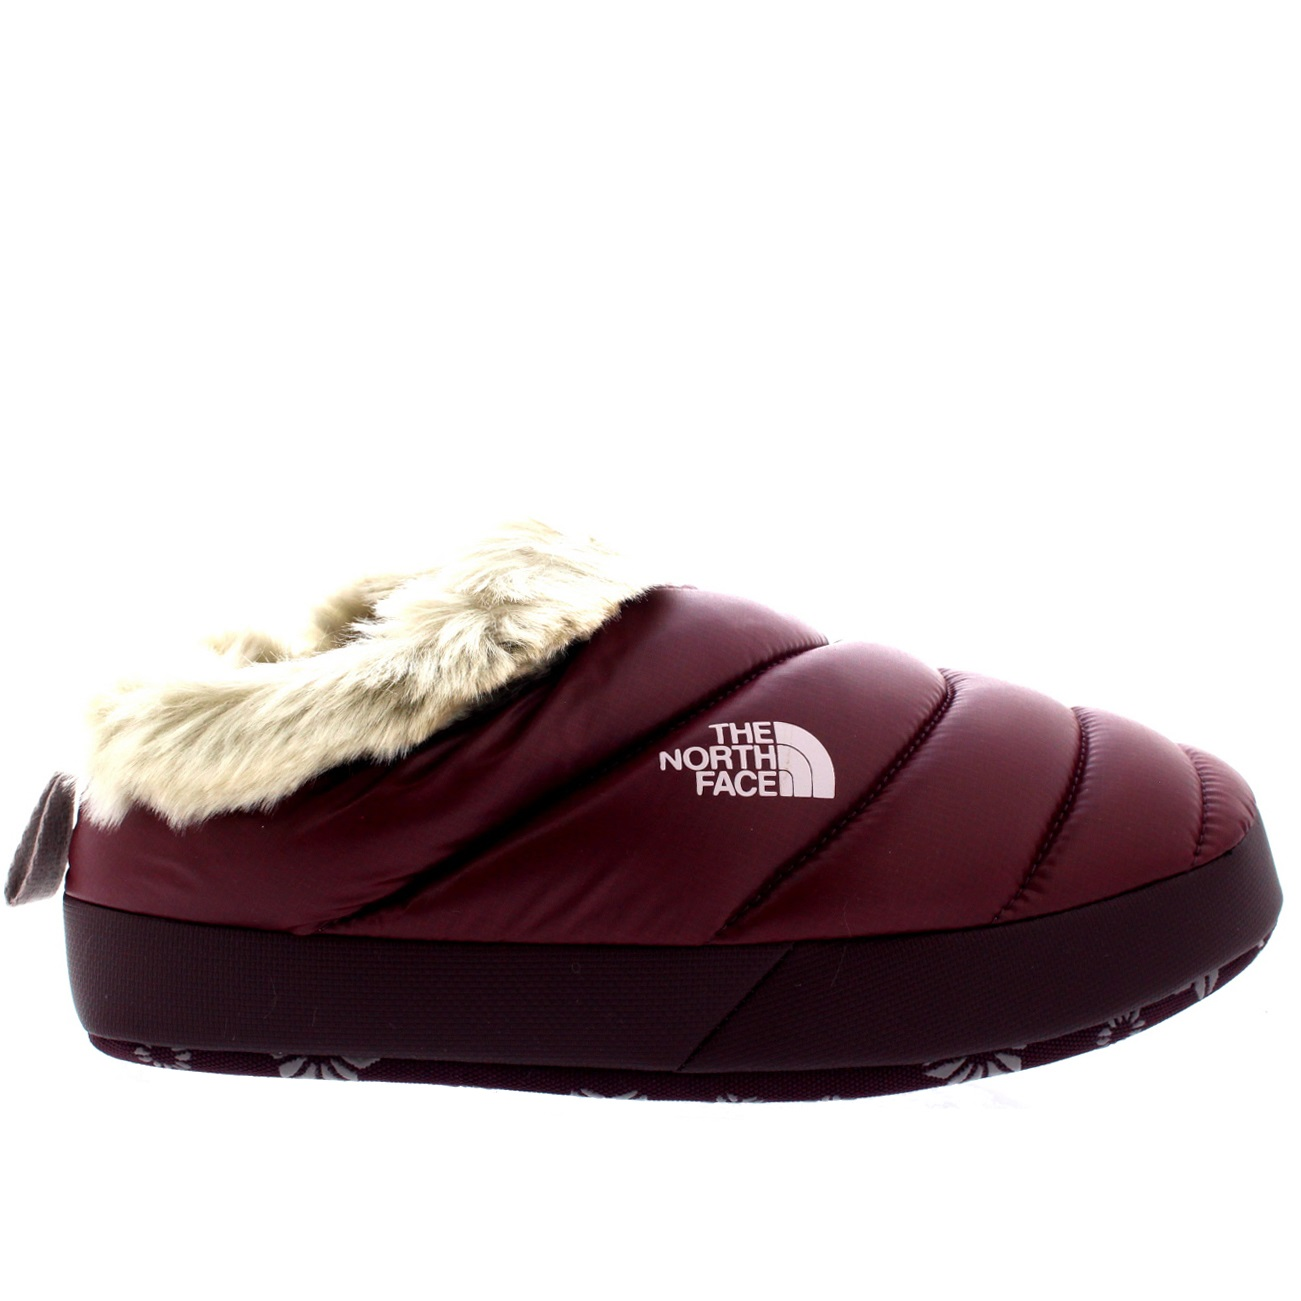 Donna The North Face Nst Tent Mule 2 Winter Slipper Faux Fur Warm Mule Slipper Winter UK 3-8.5 3199a0